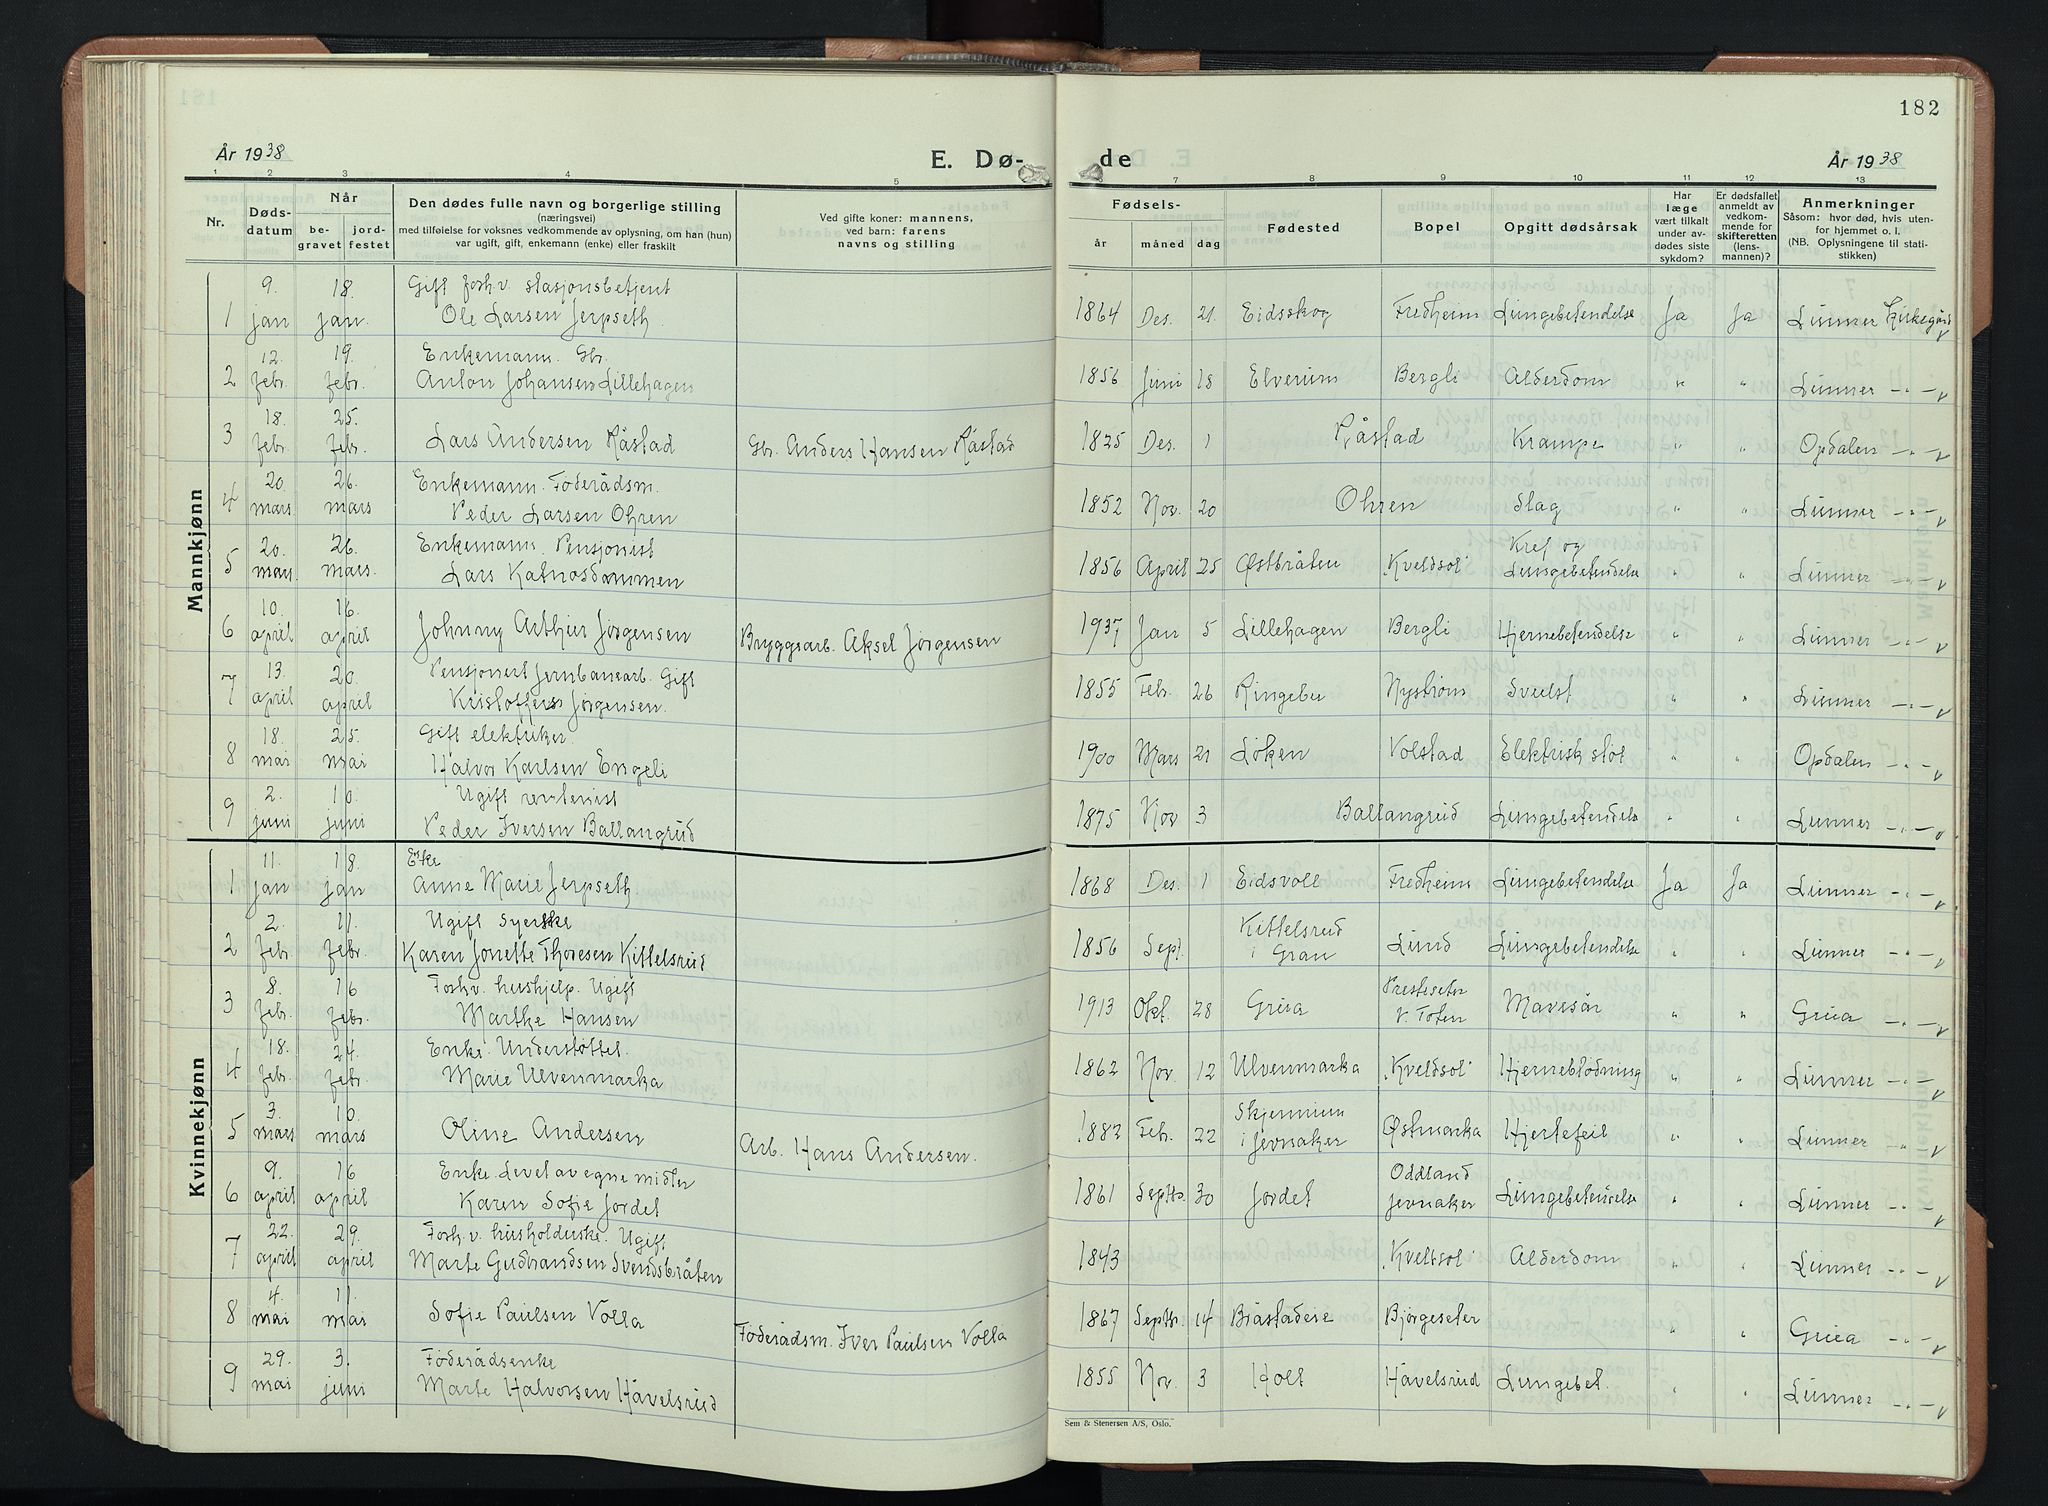 SAH, Lunner prestekontor, H/Ha/Hab/L0003: Klokkerbok nr. 3, 1933-1945, s. 182